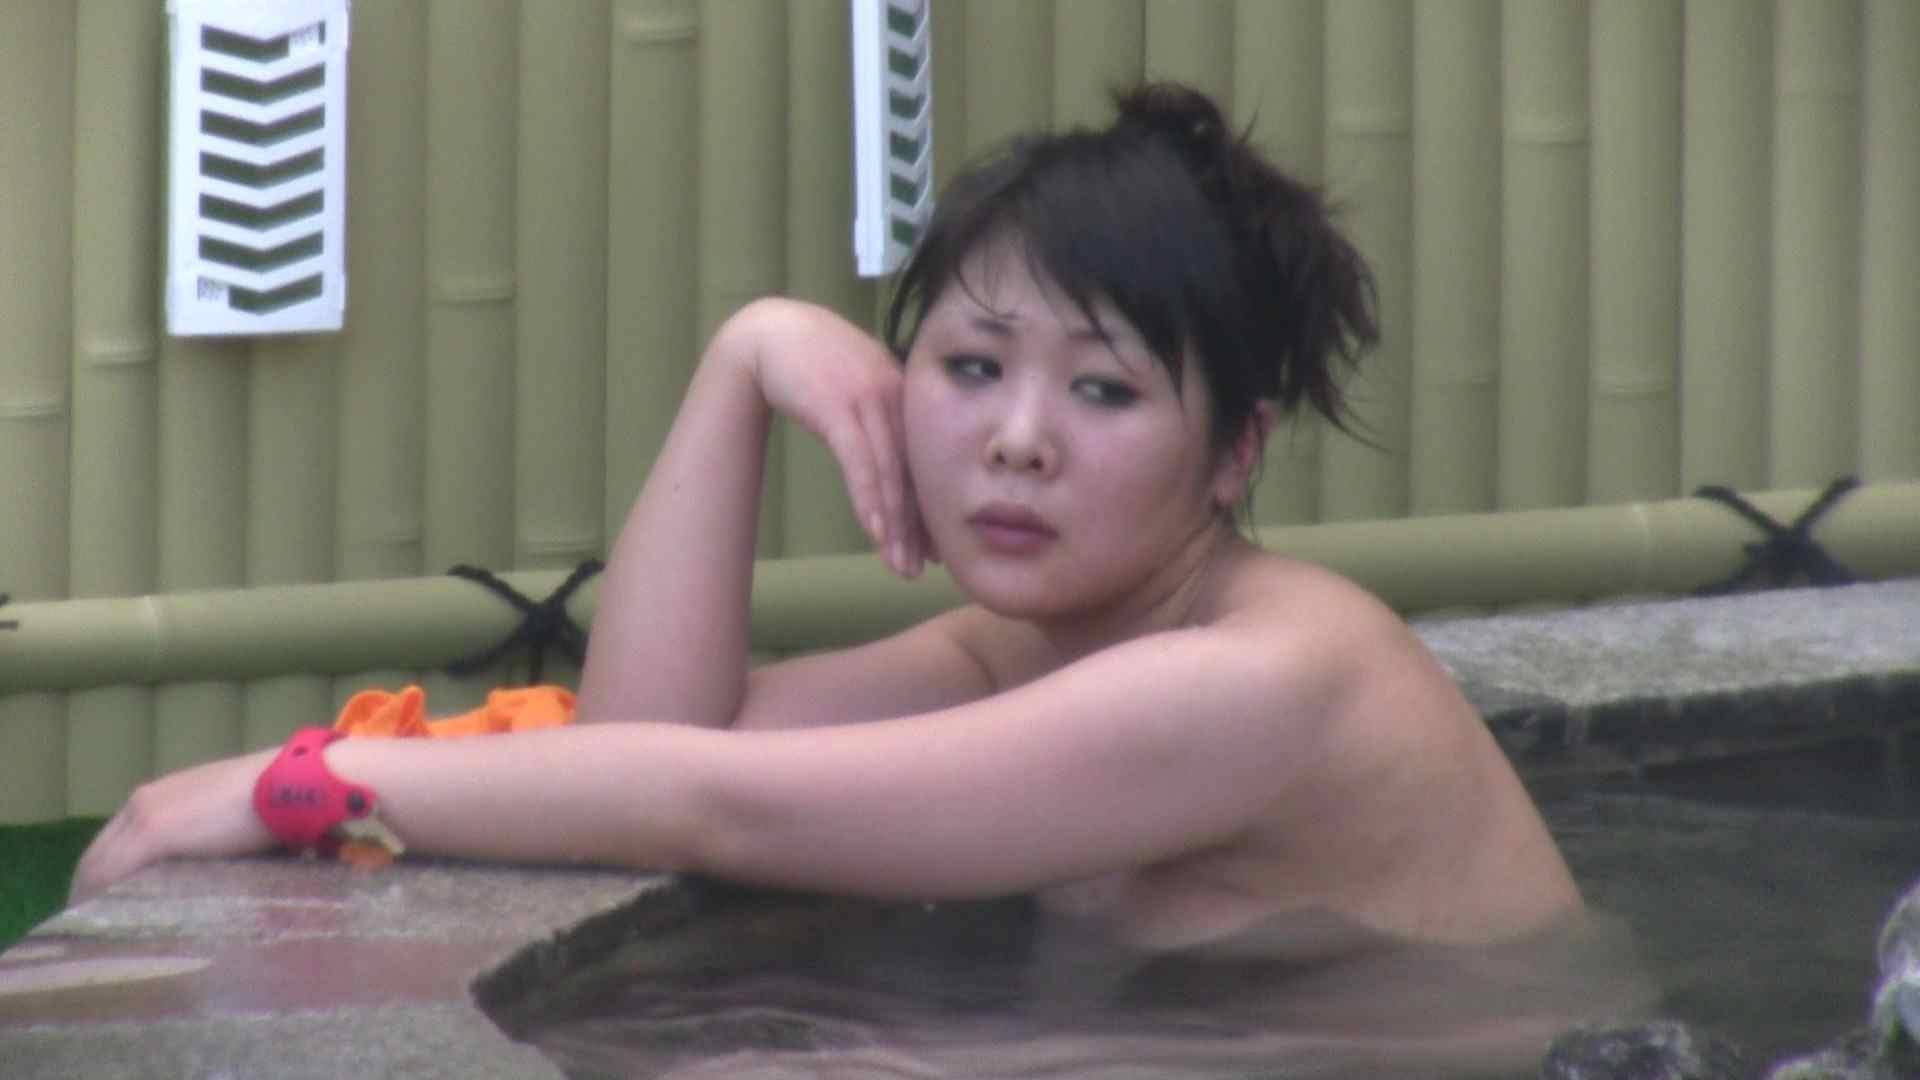 Aquaな露天風呂Vol.118 女体盗撮 隠し撮りAV無料 68連発 65